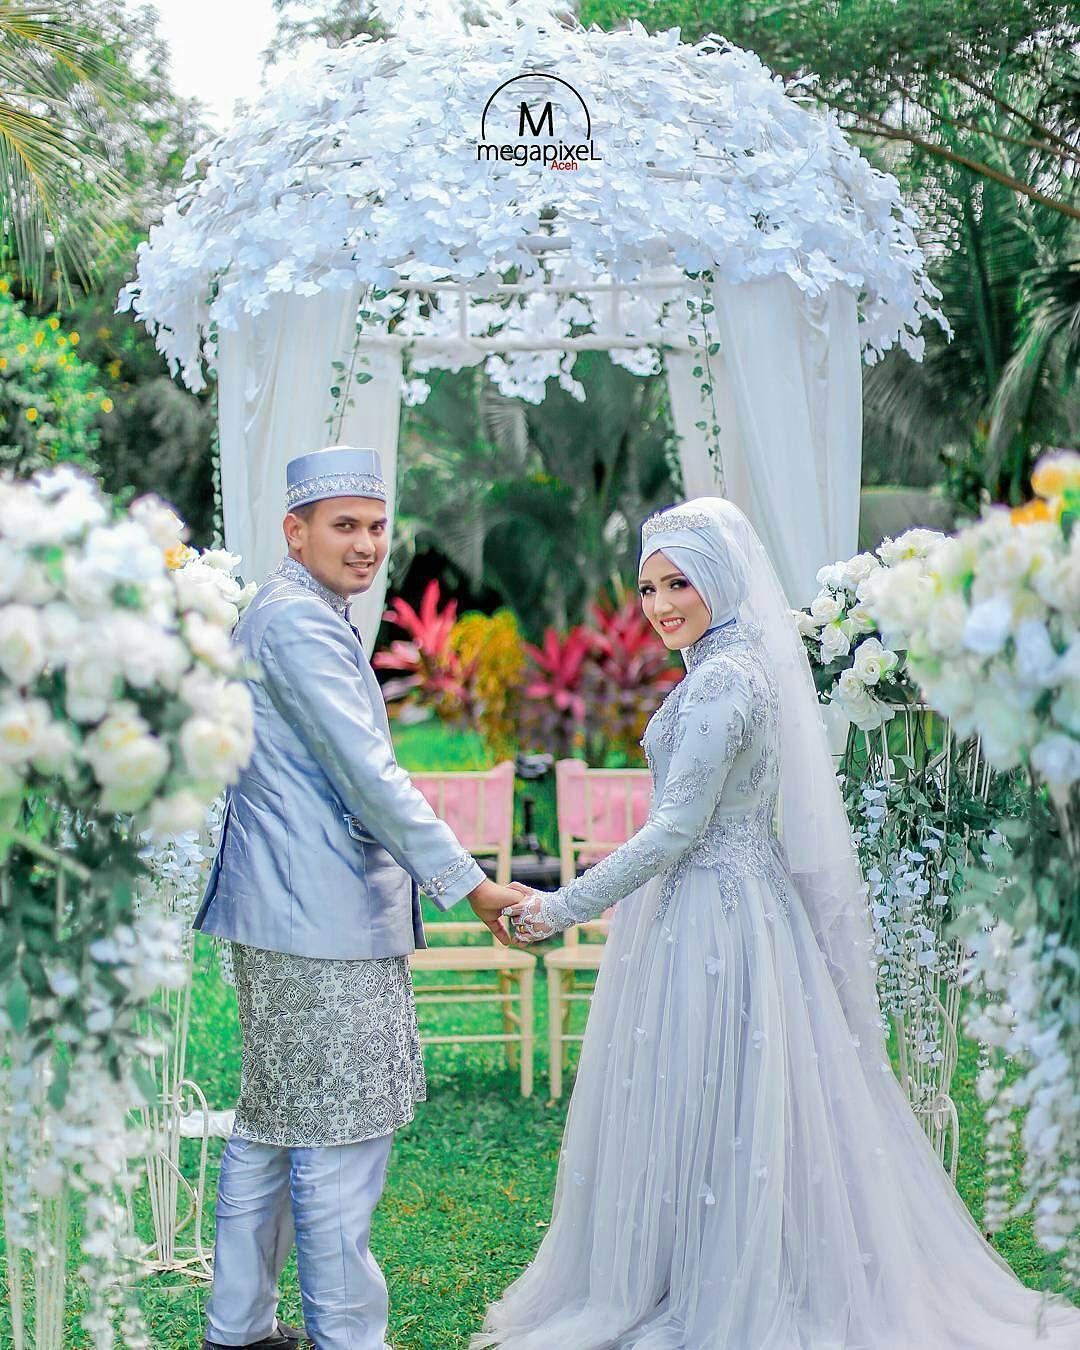 Pin by ImmaRahim on Hijab wedding | Pinterest | Muslim, Wedding and ...